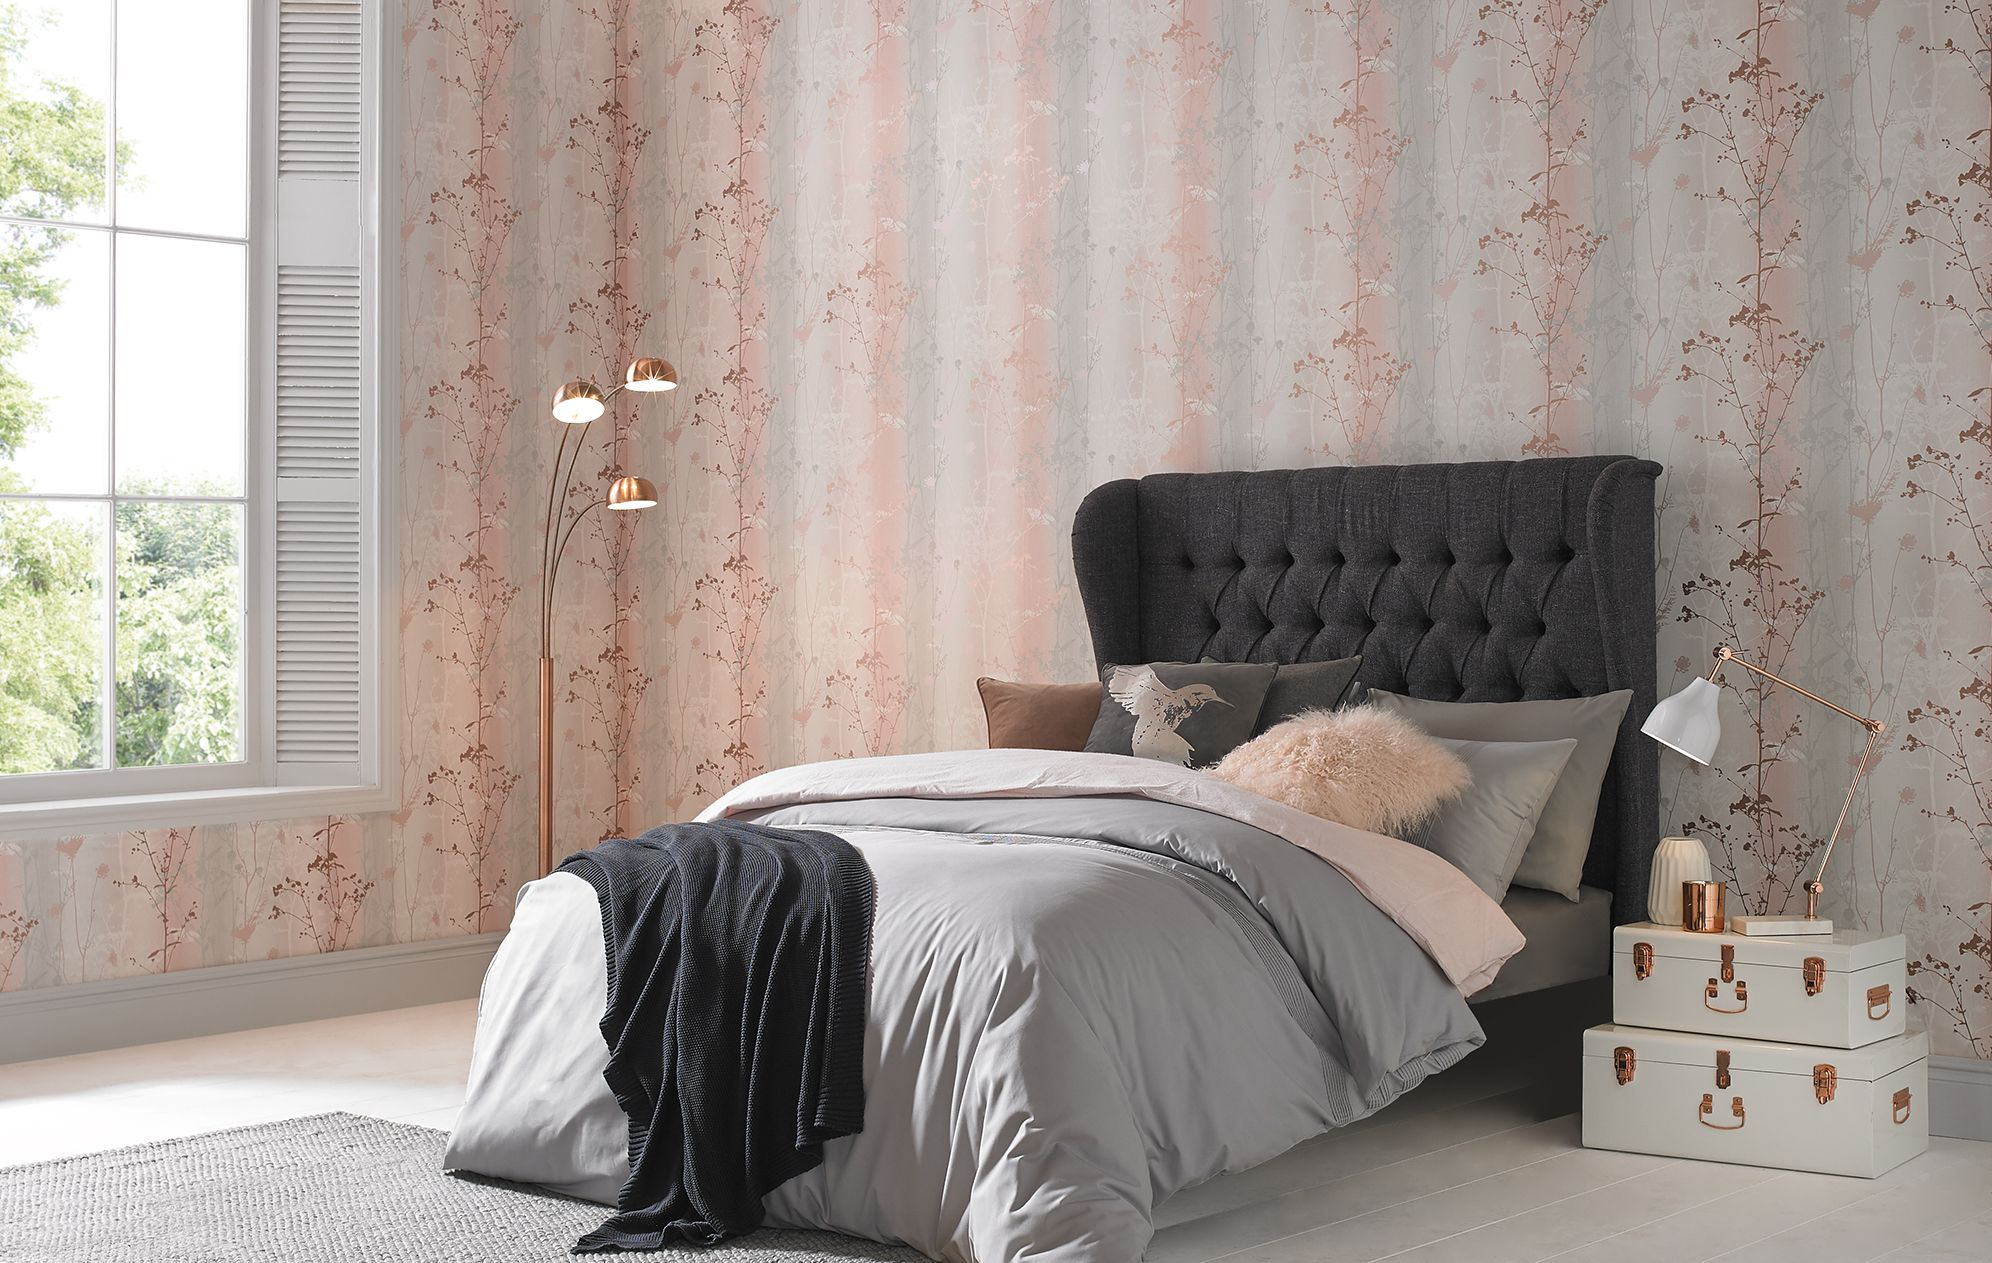 13 Bedroom Wallpaper Ideas To Help Banish Plain Walls